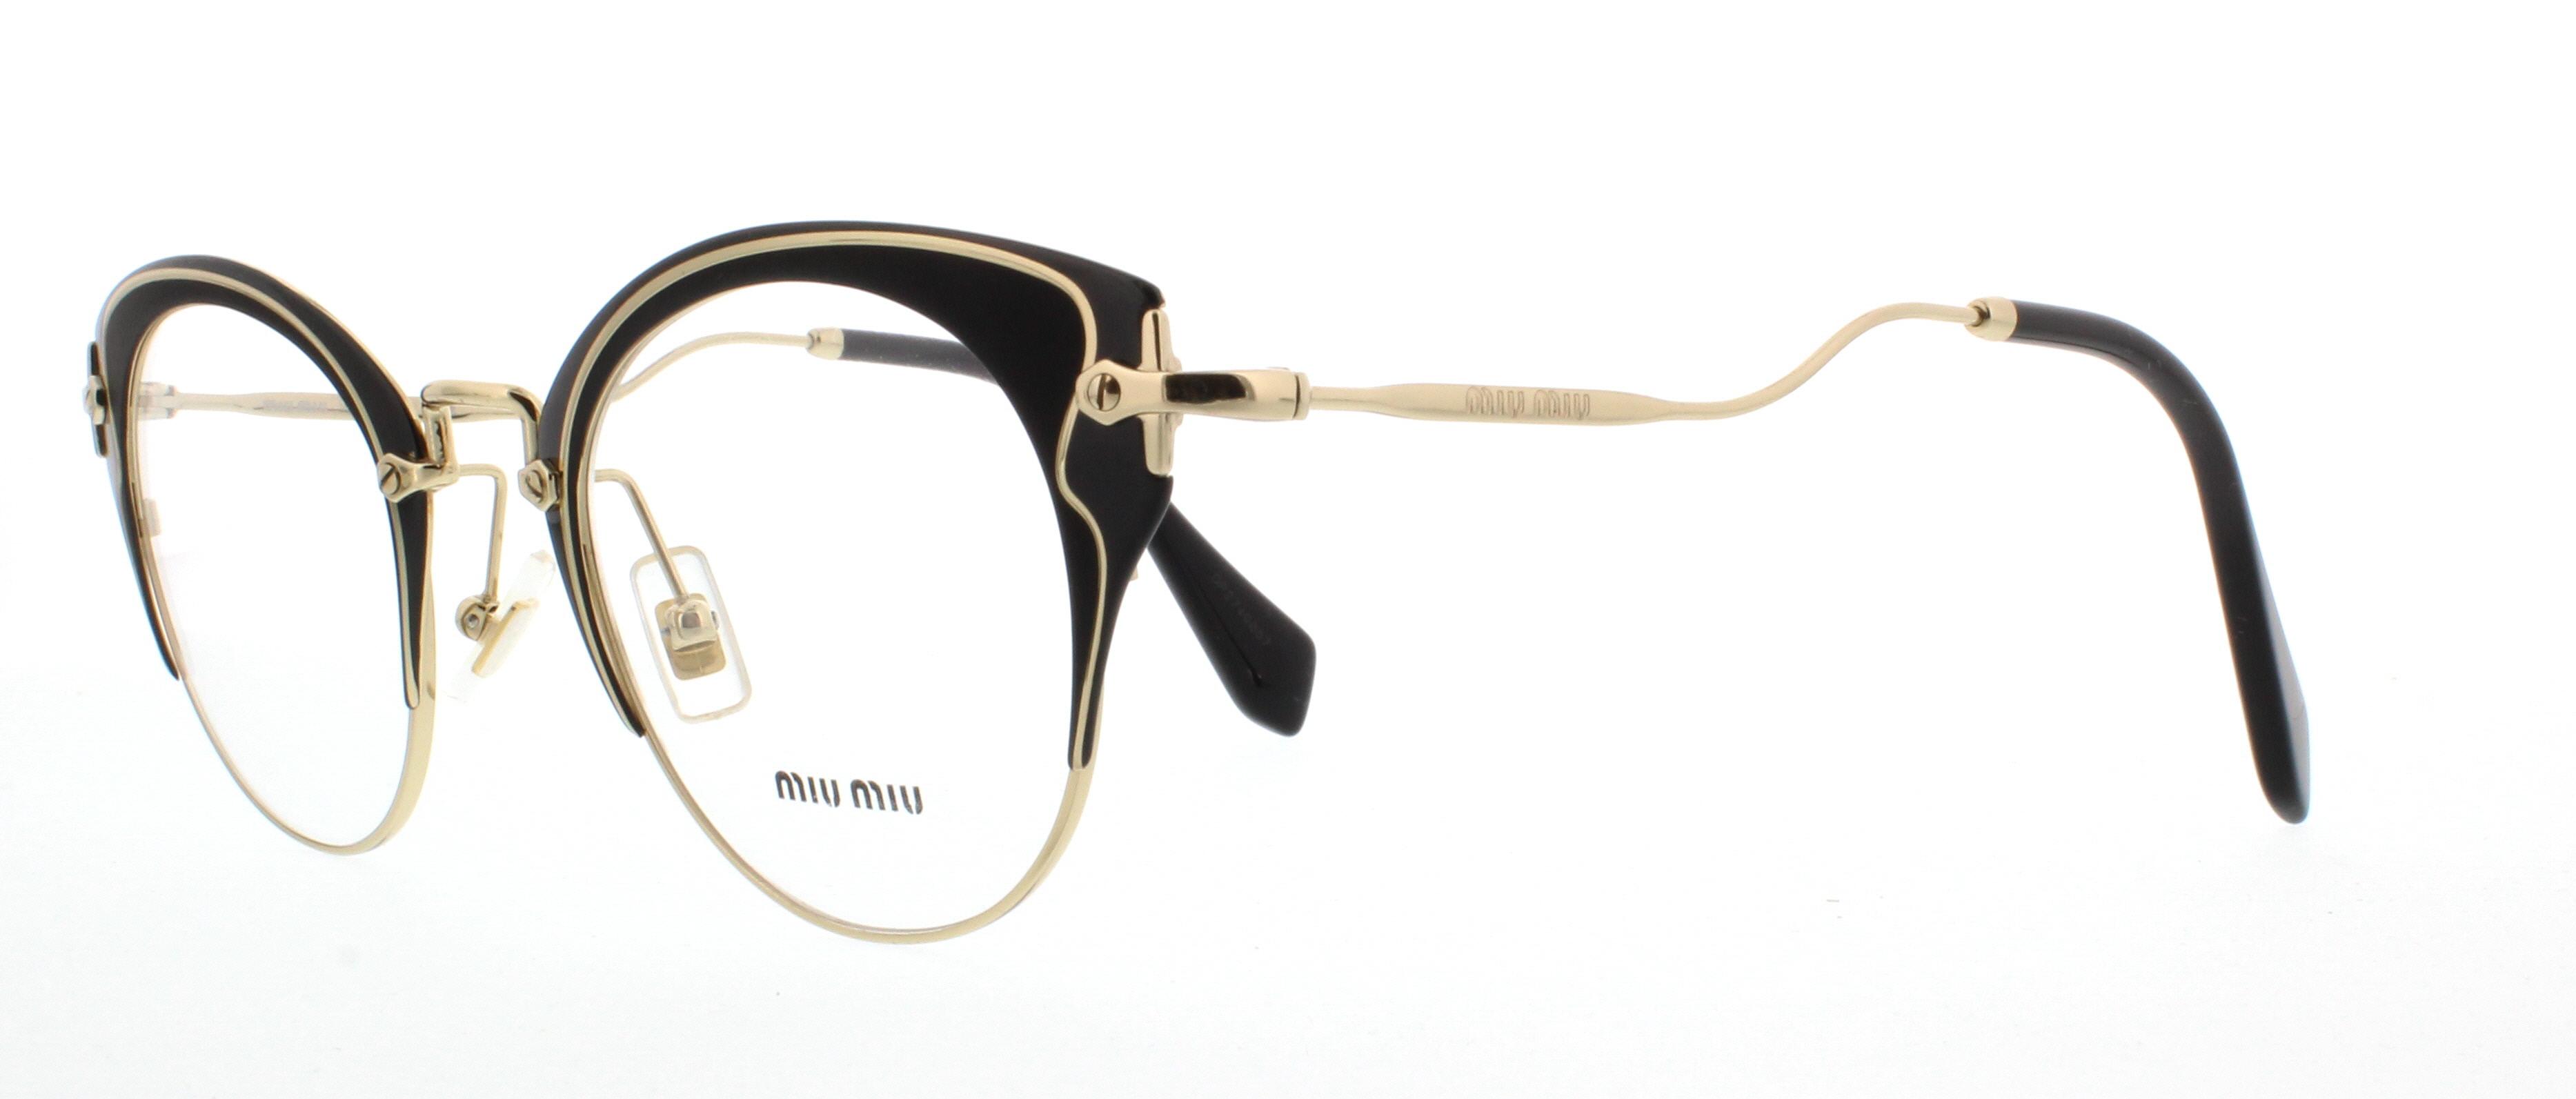 9e6ee3e5065 Miu Miu Mu 03qva Eyeglasses